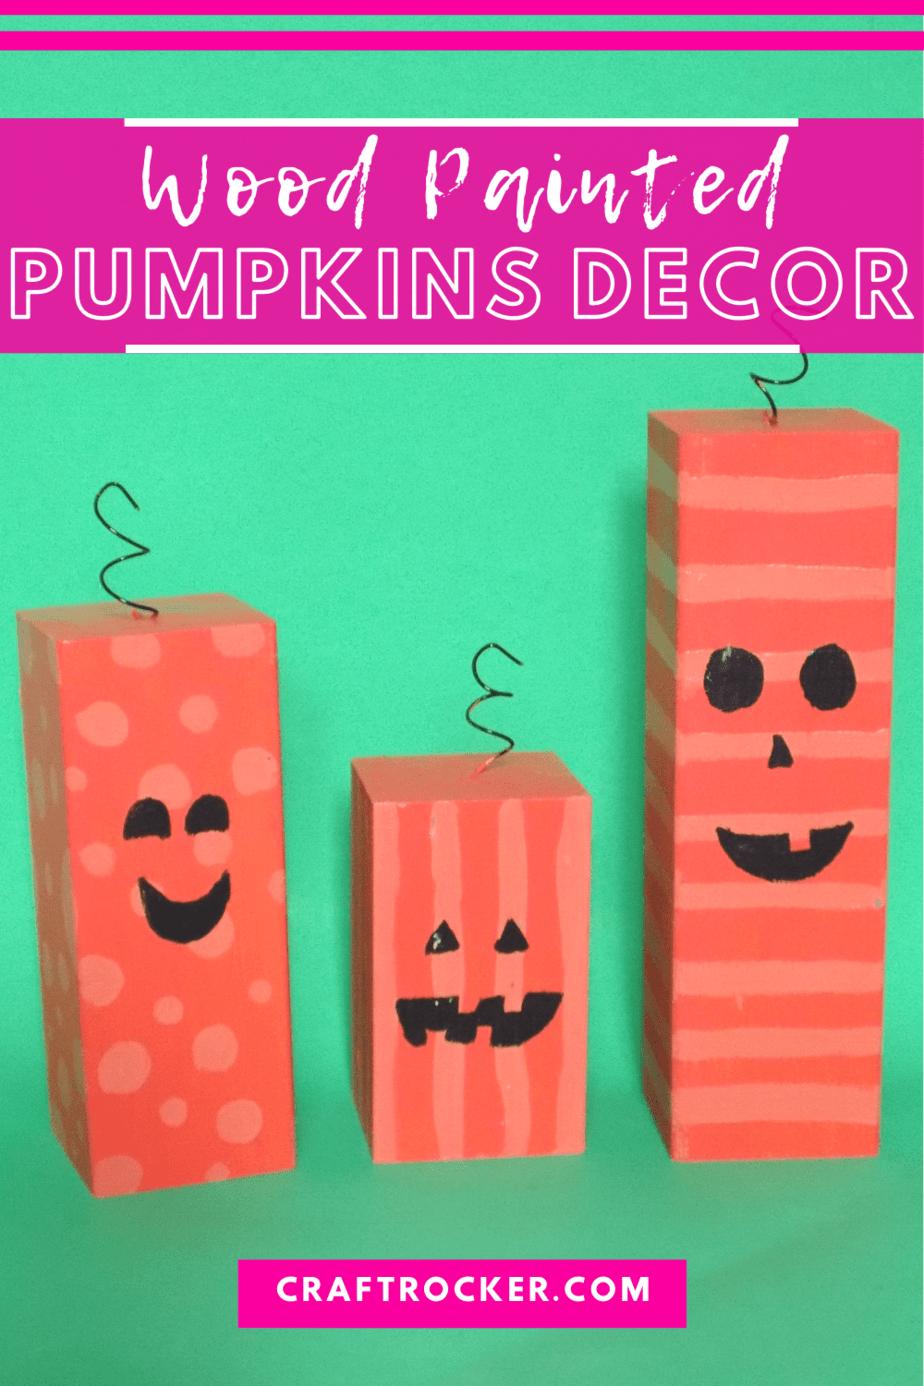 Wood Pumpkins on Green Background with text overlay - Wood Painted Pumpkins Decor - Craft Rocker